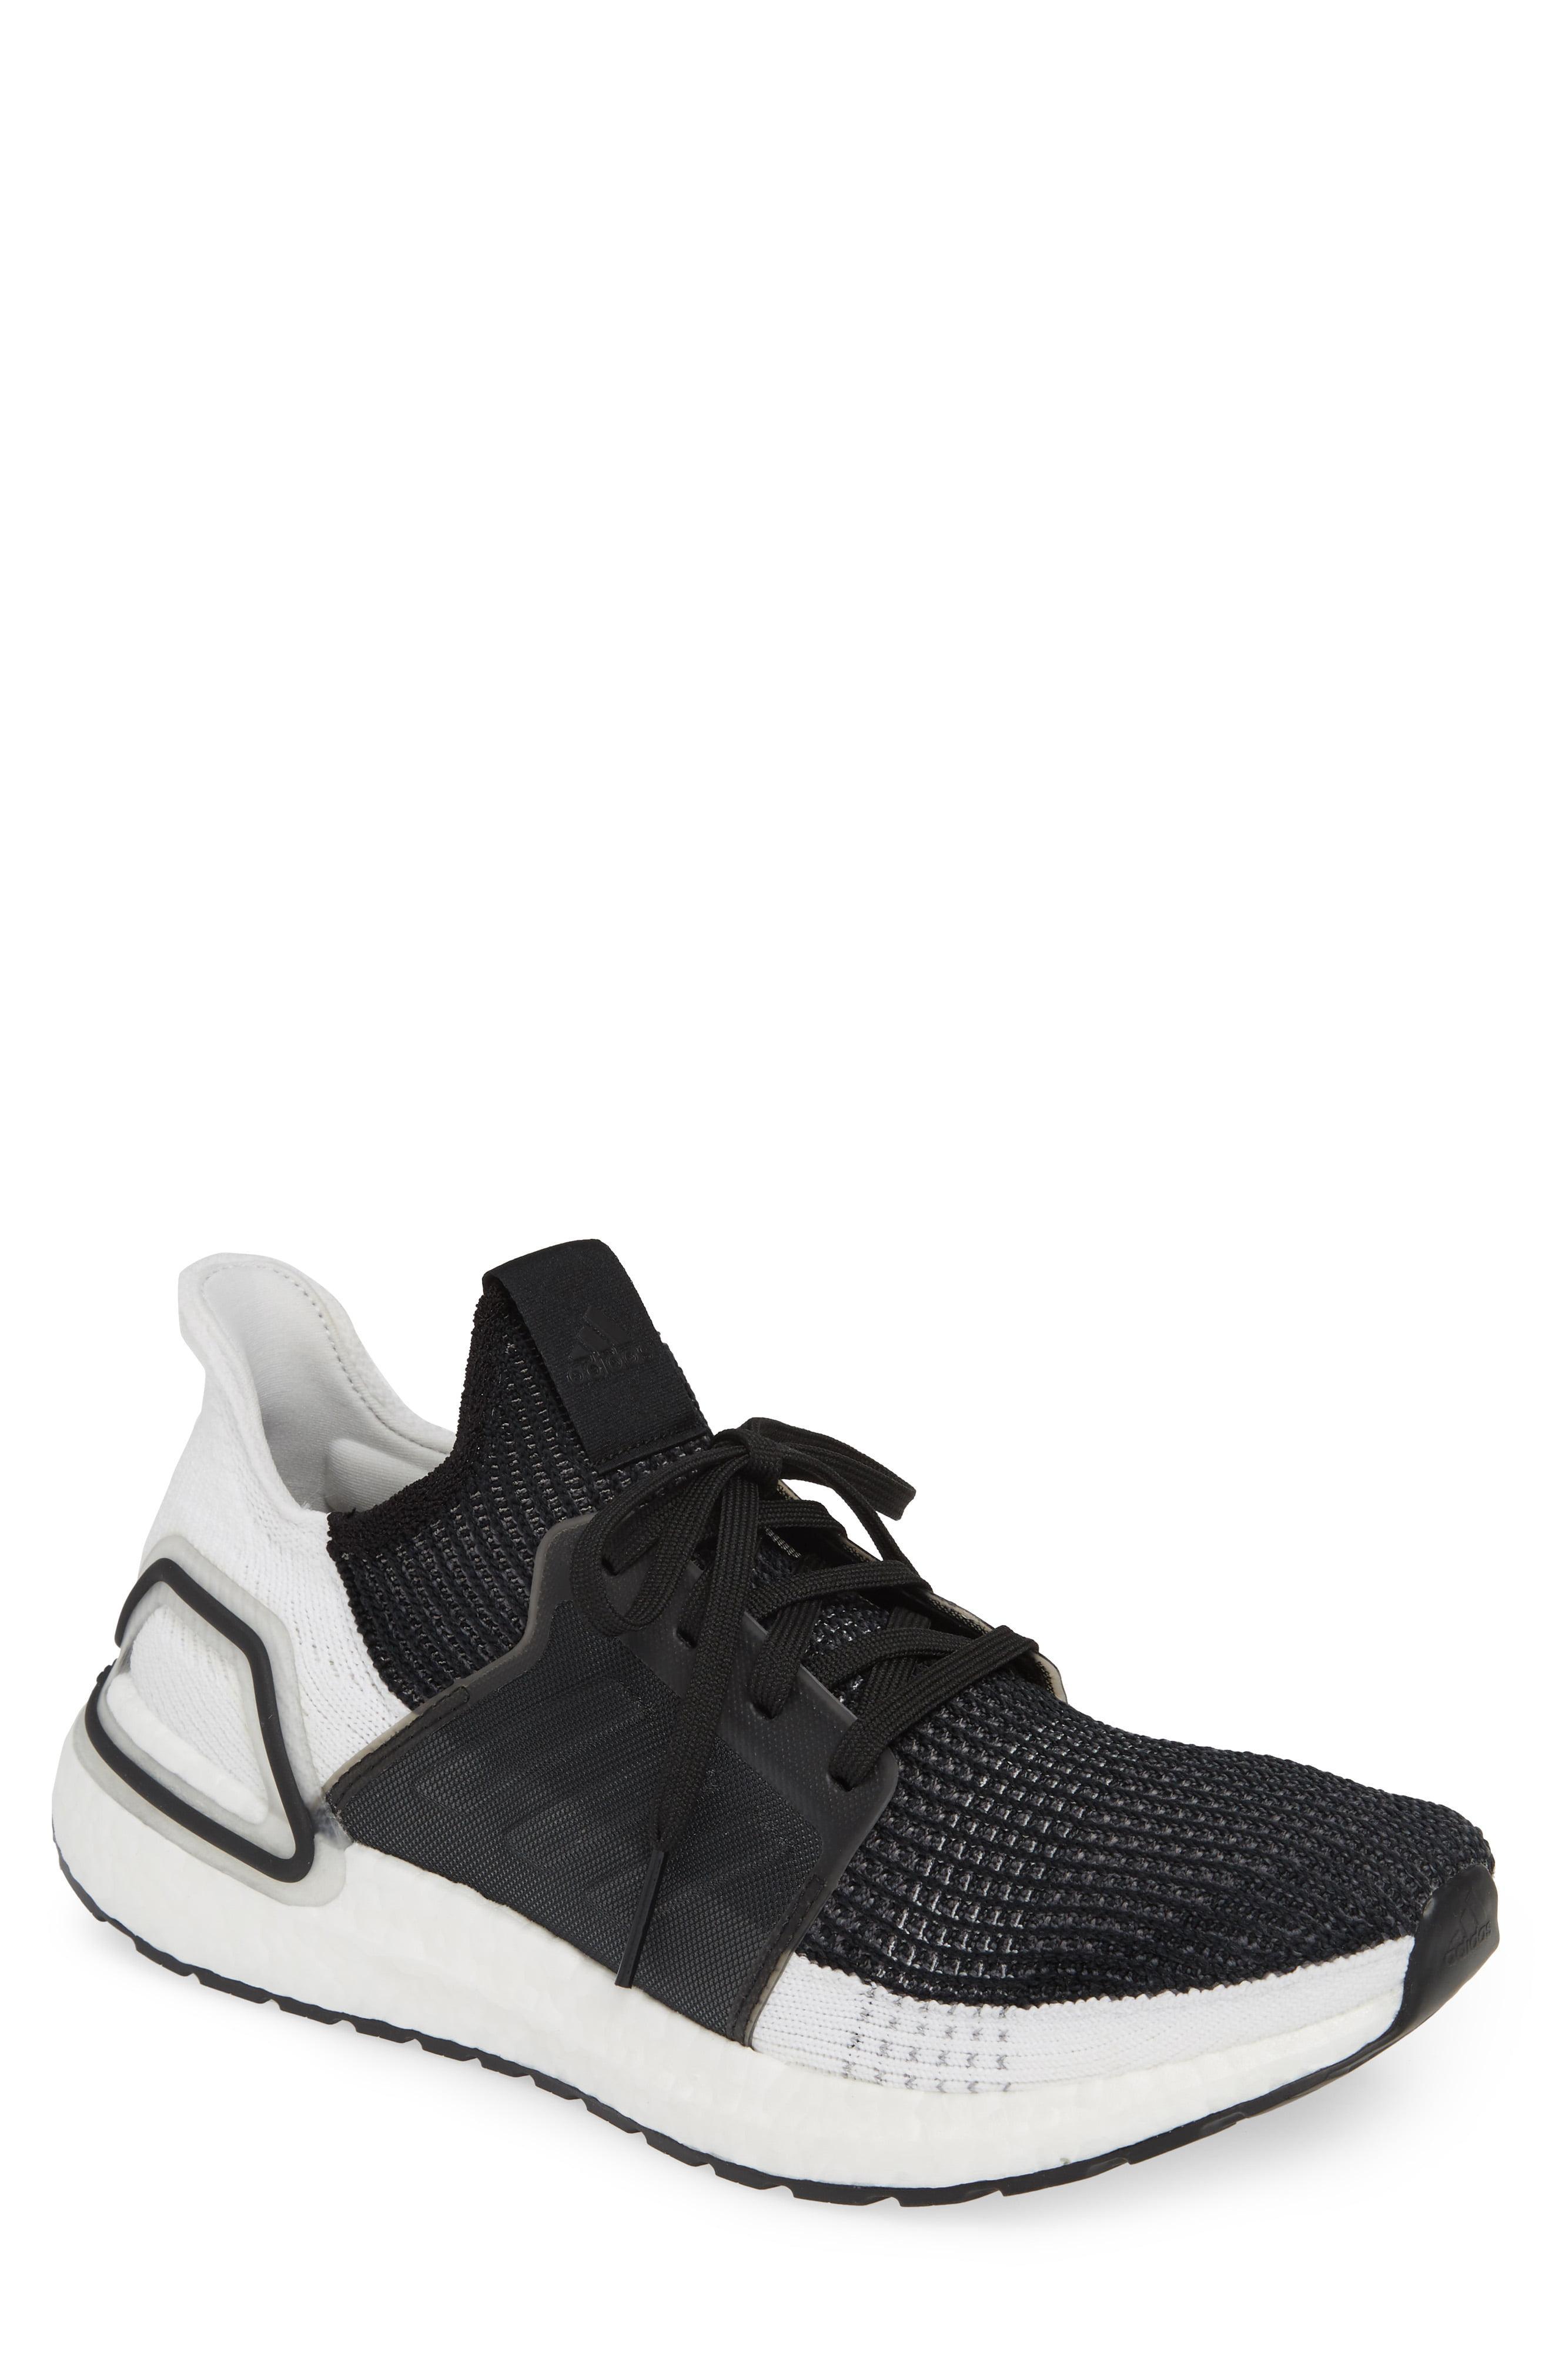 2fa32b6c12451 Lyst - adidas Men s Ultraboost 19 Primeknit Low-top Sneakers in ...